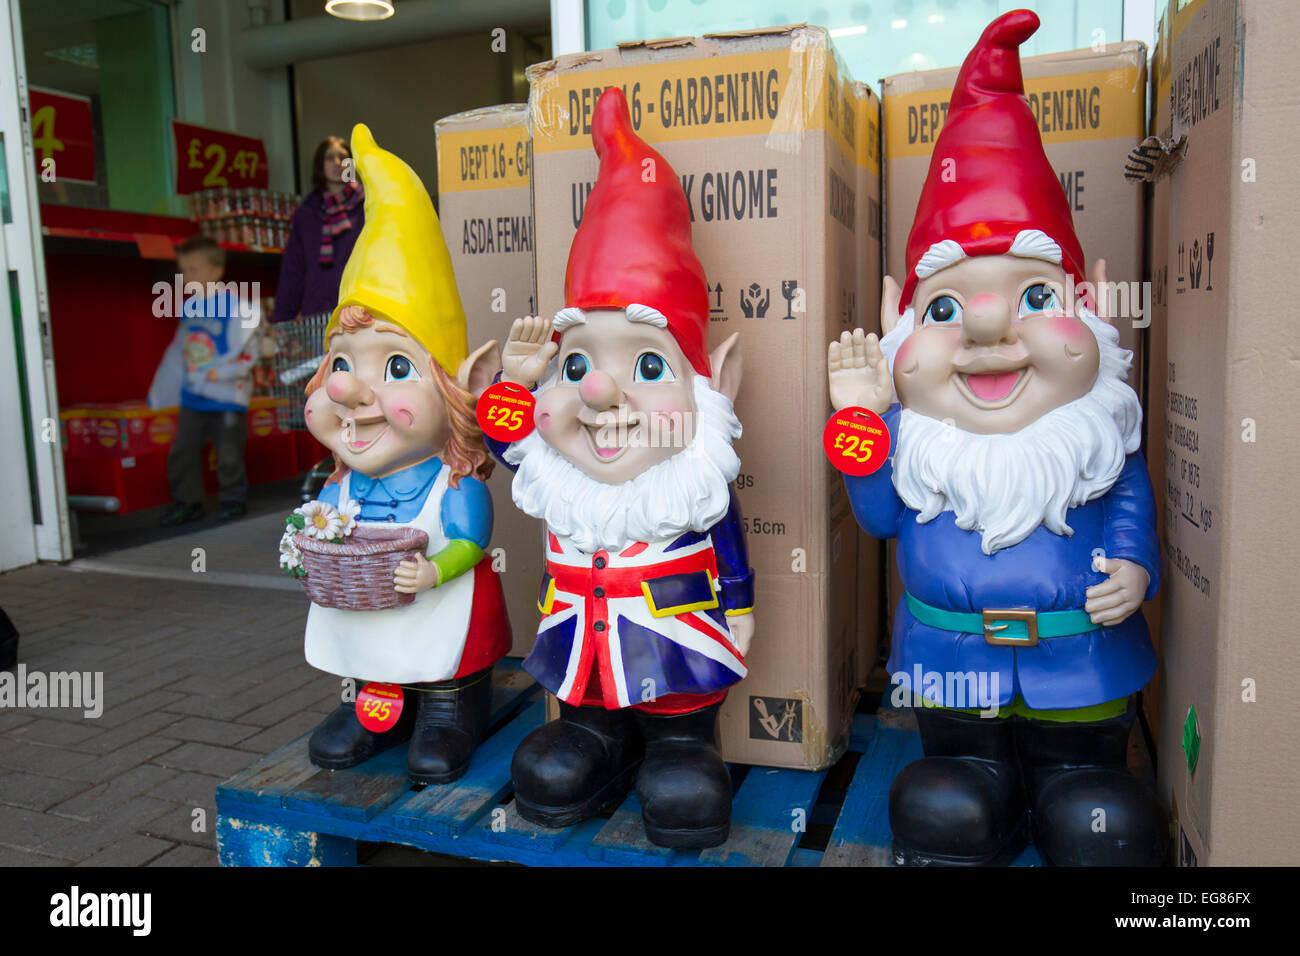 Garden Gnomes On Sale: Giant Garden Gnomes On Sale At Asada Kendal Stock Photo